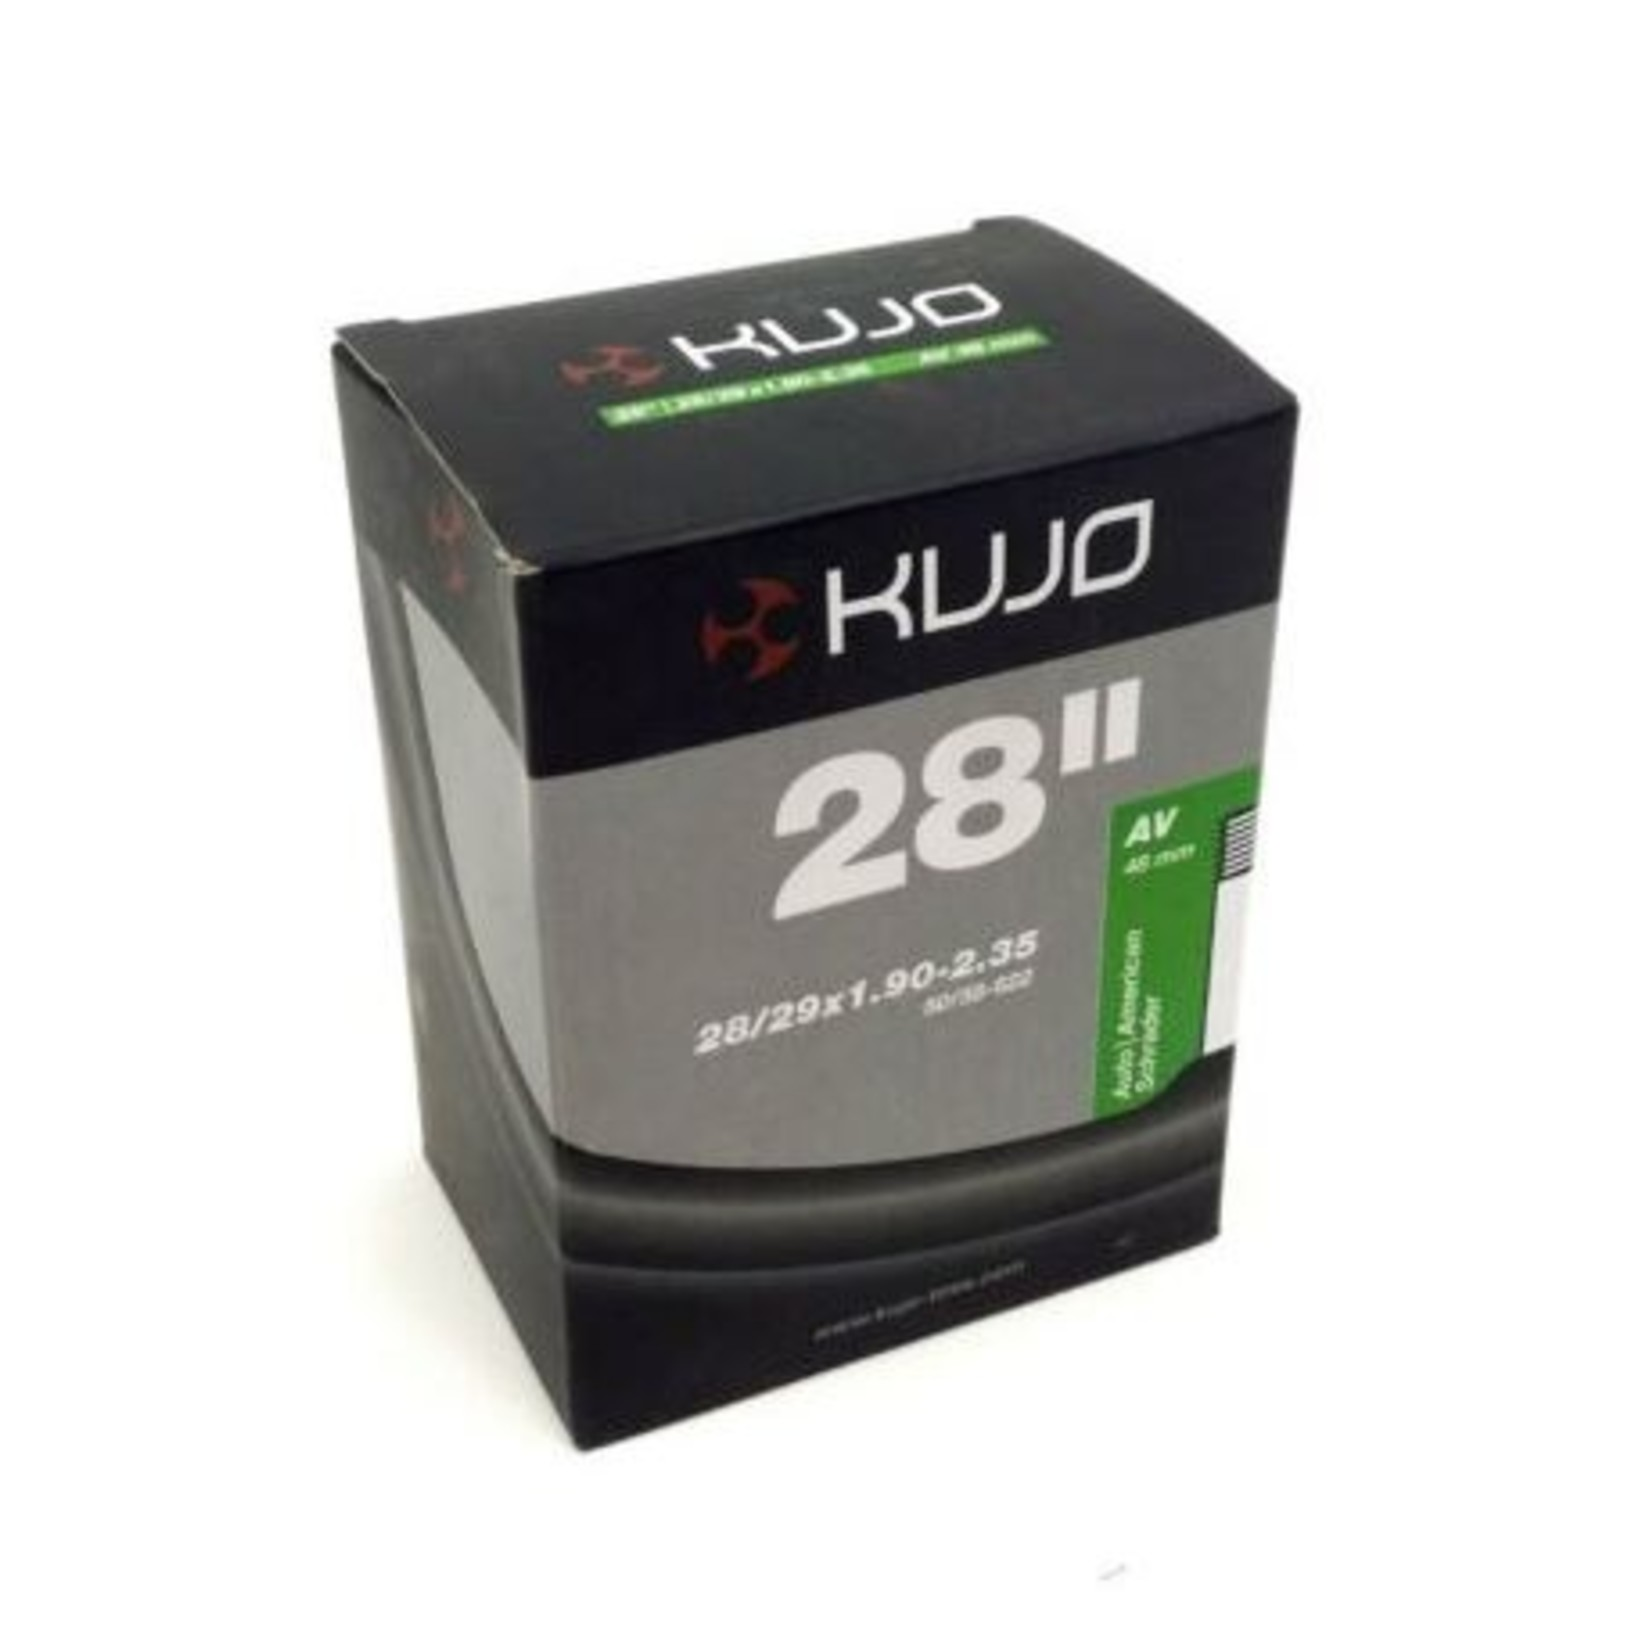 KUJO 28/29 x 1.90-2.35 33mm Valve Tube